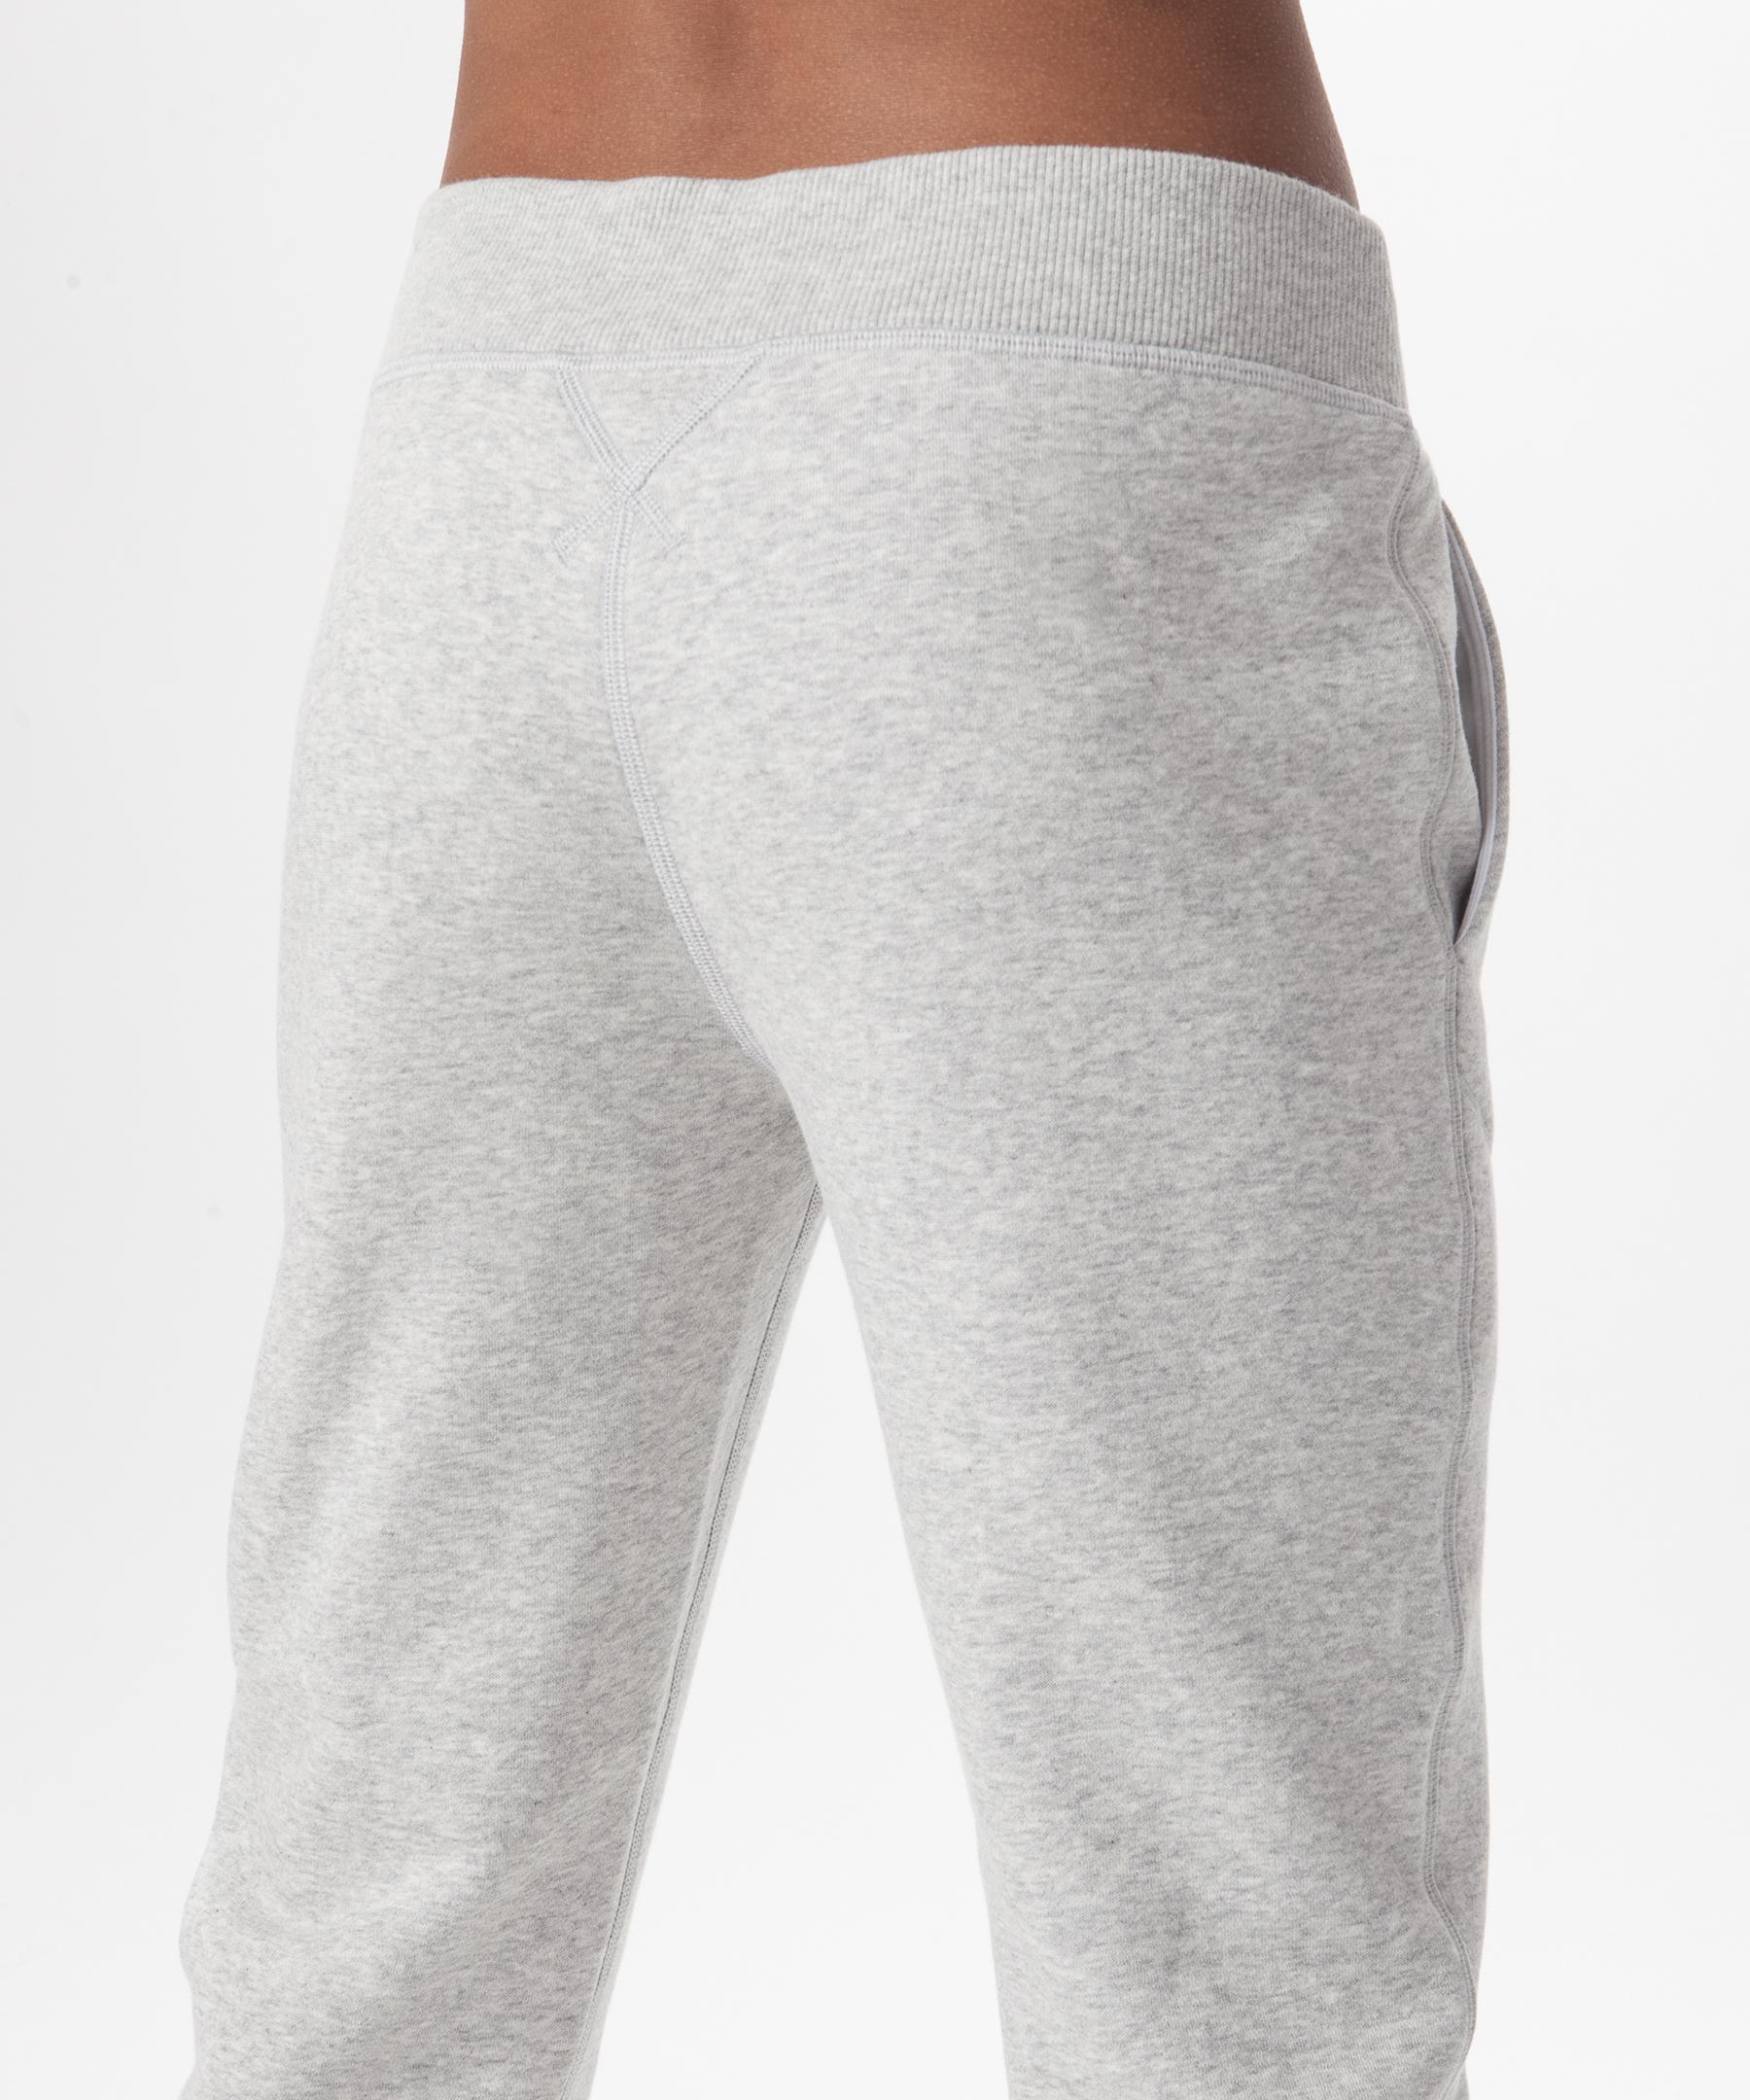 cd6c82c934 Lyst - lululemon athletica Forever In Fleece Sweatpant - Girls in Gray